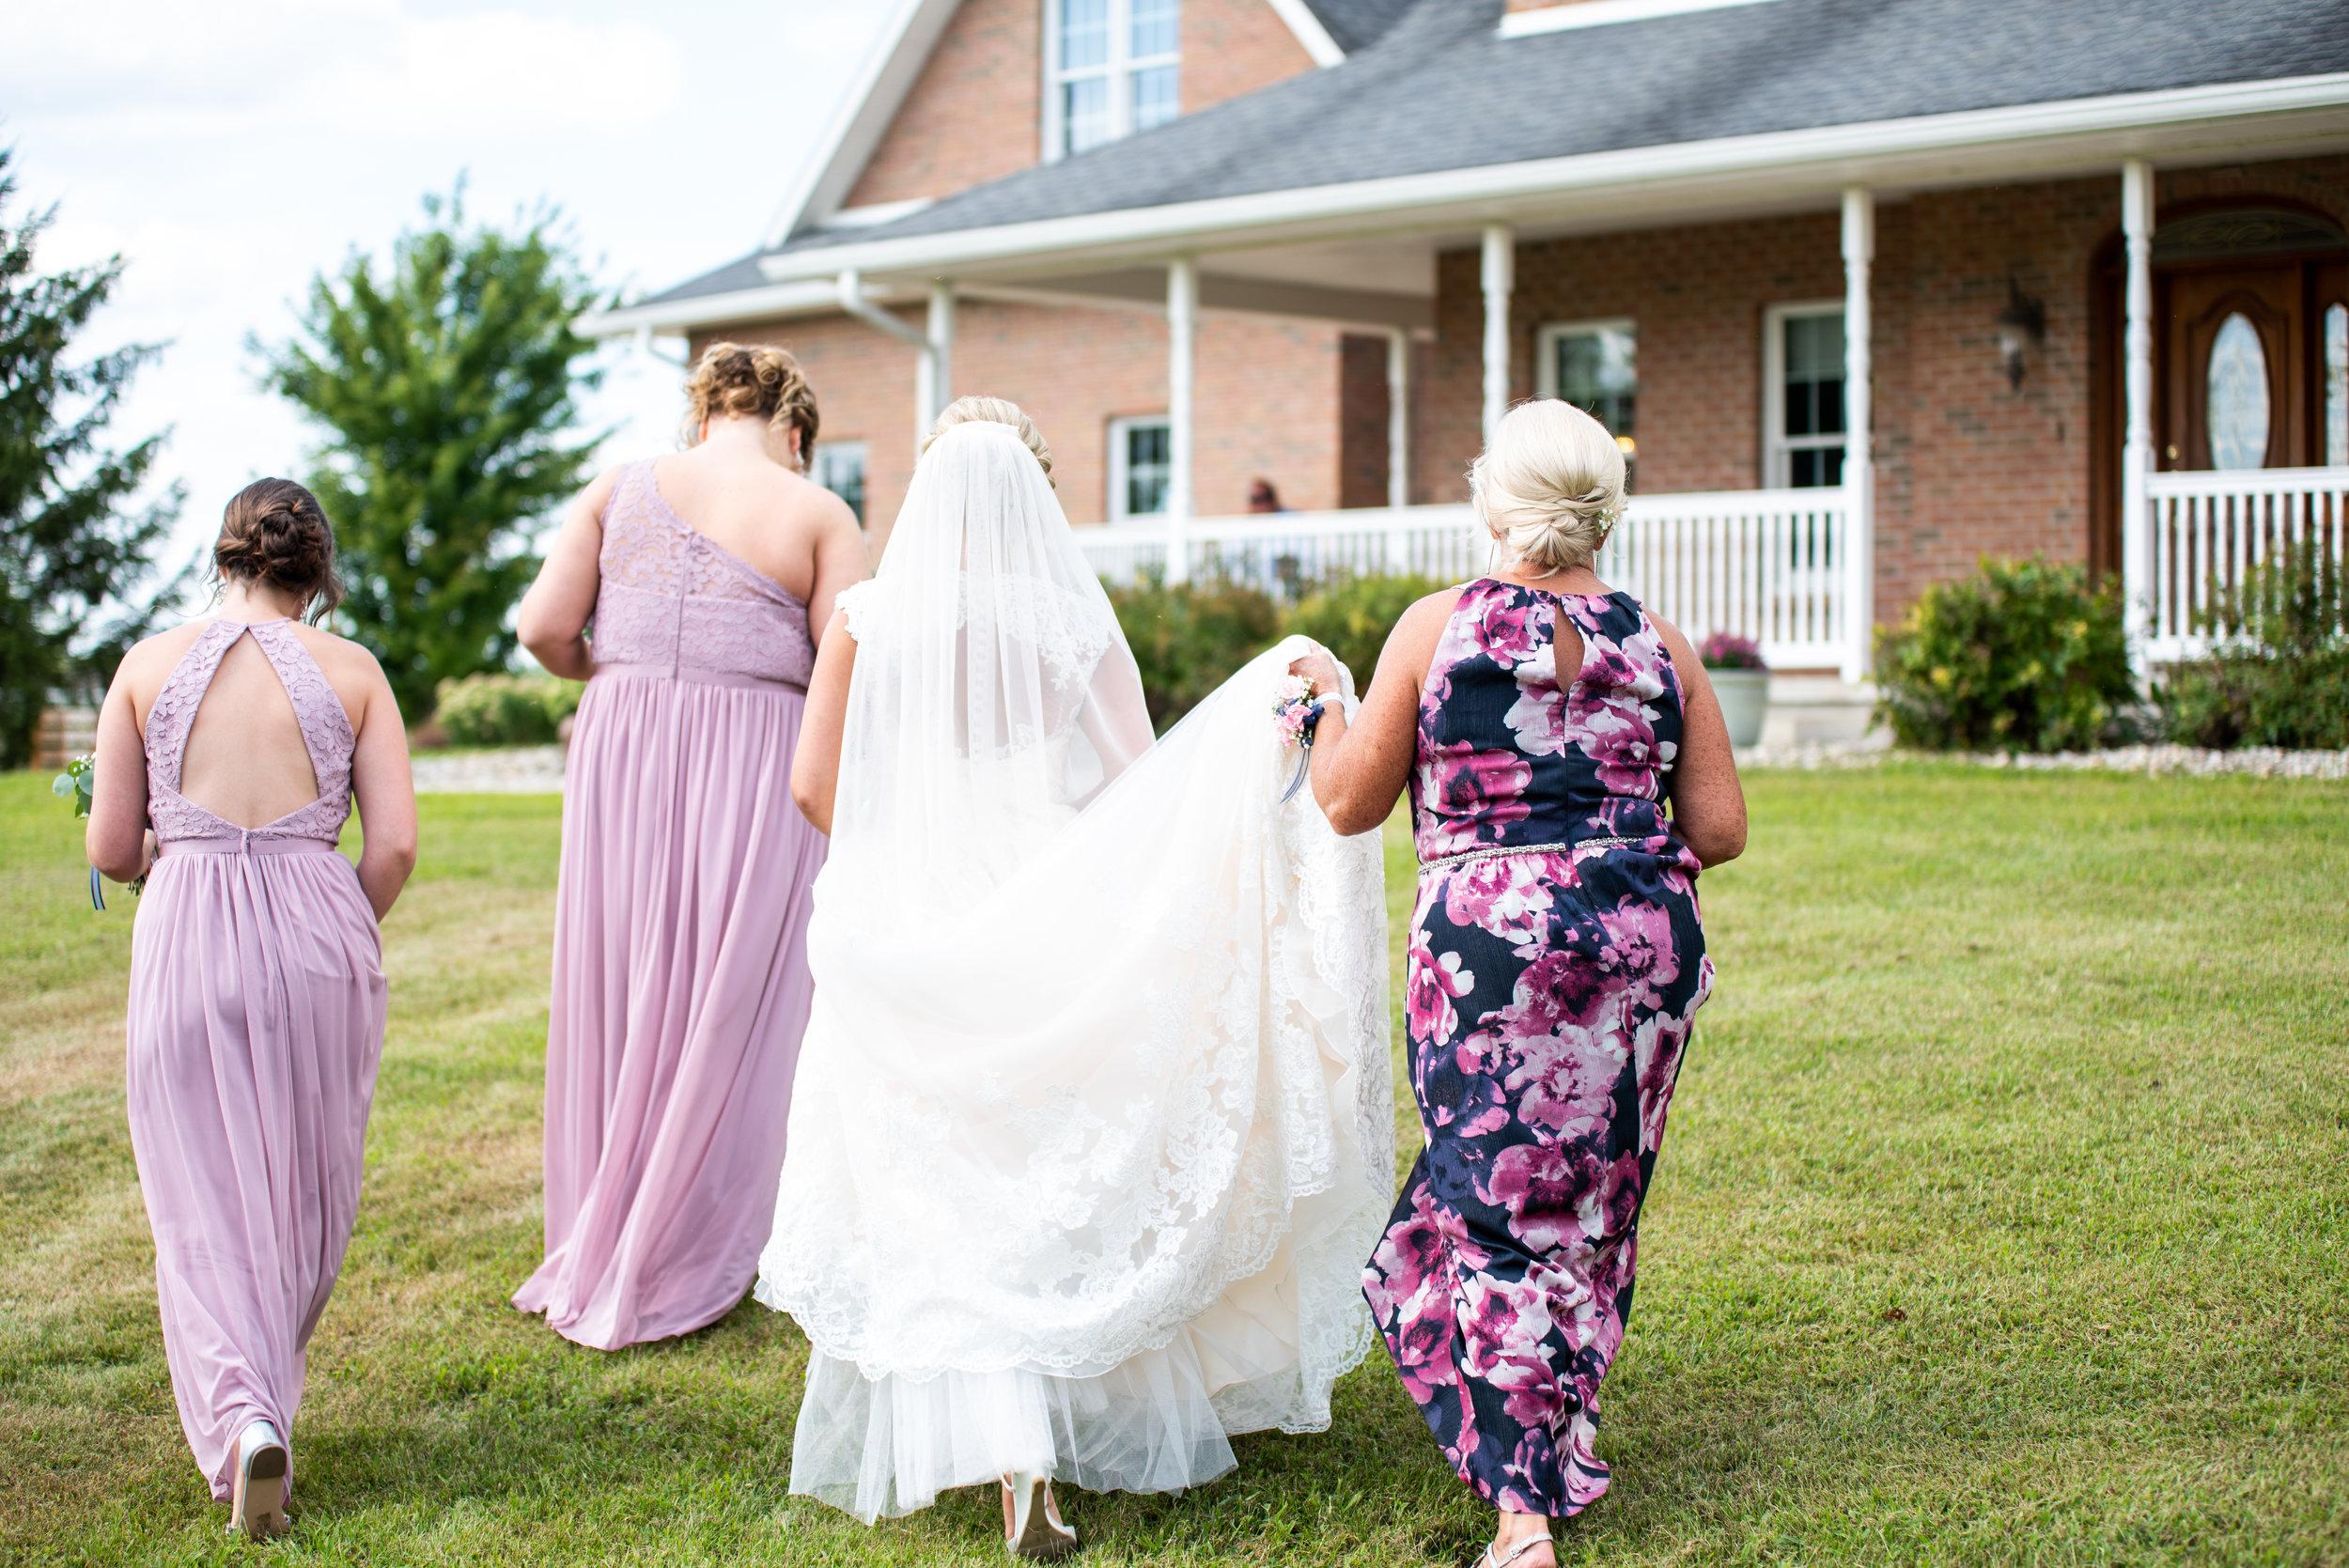 wedding (1 of 1)-48.jpg